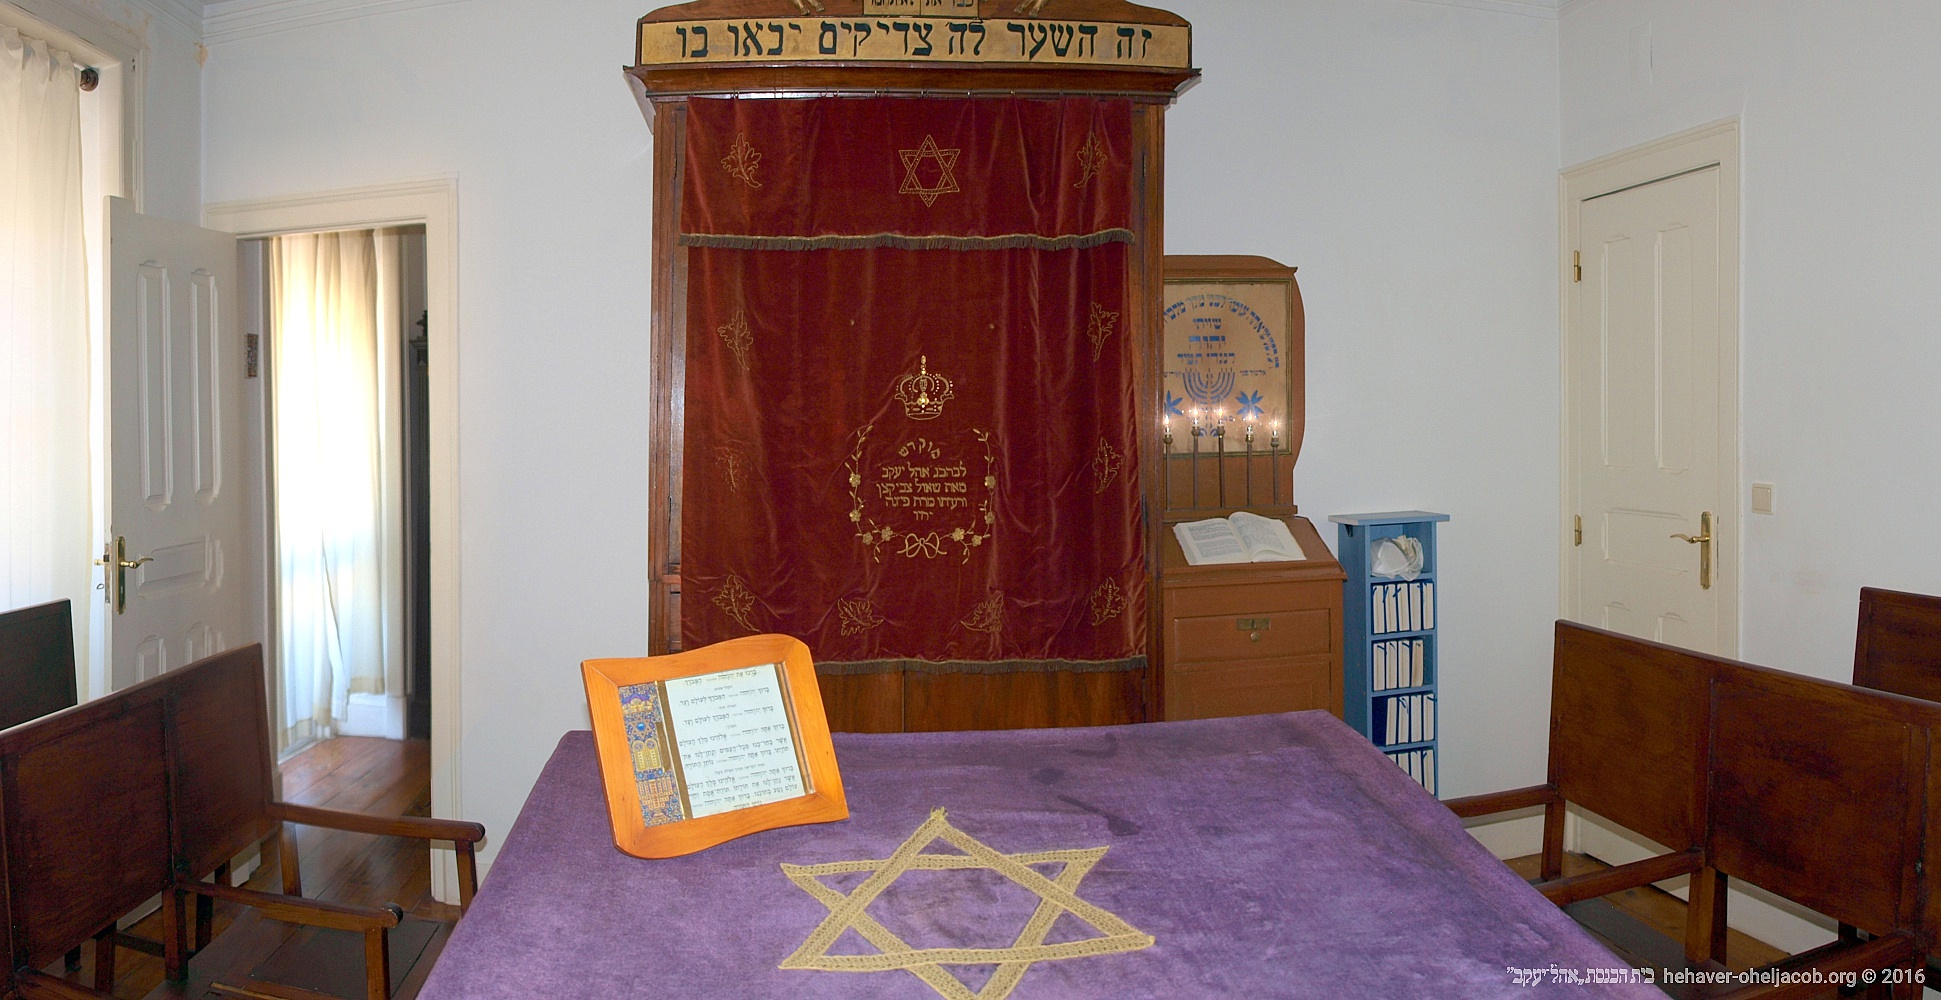 Sinagoga Elal